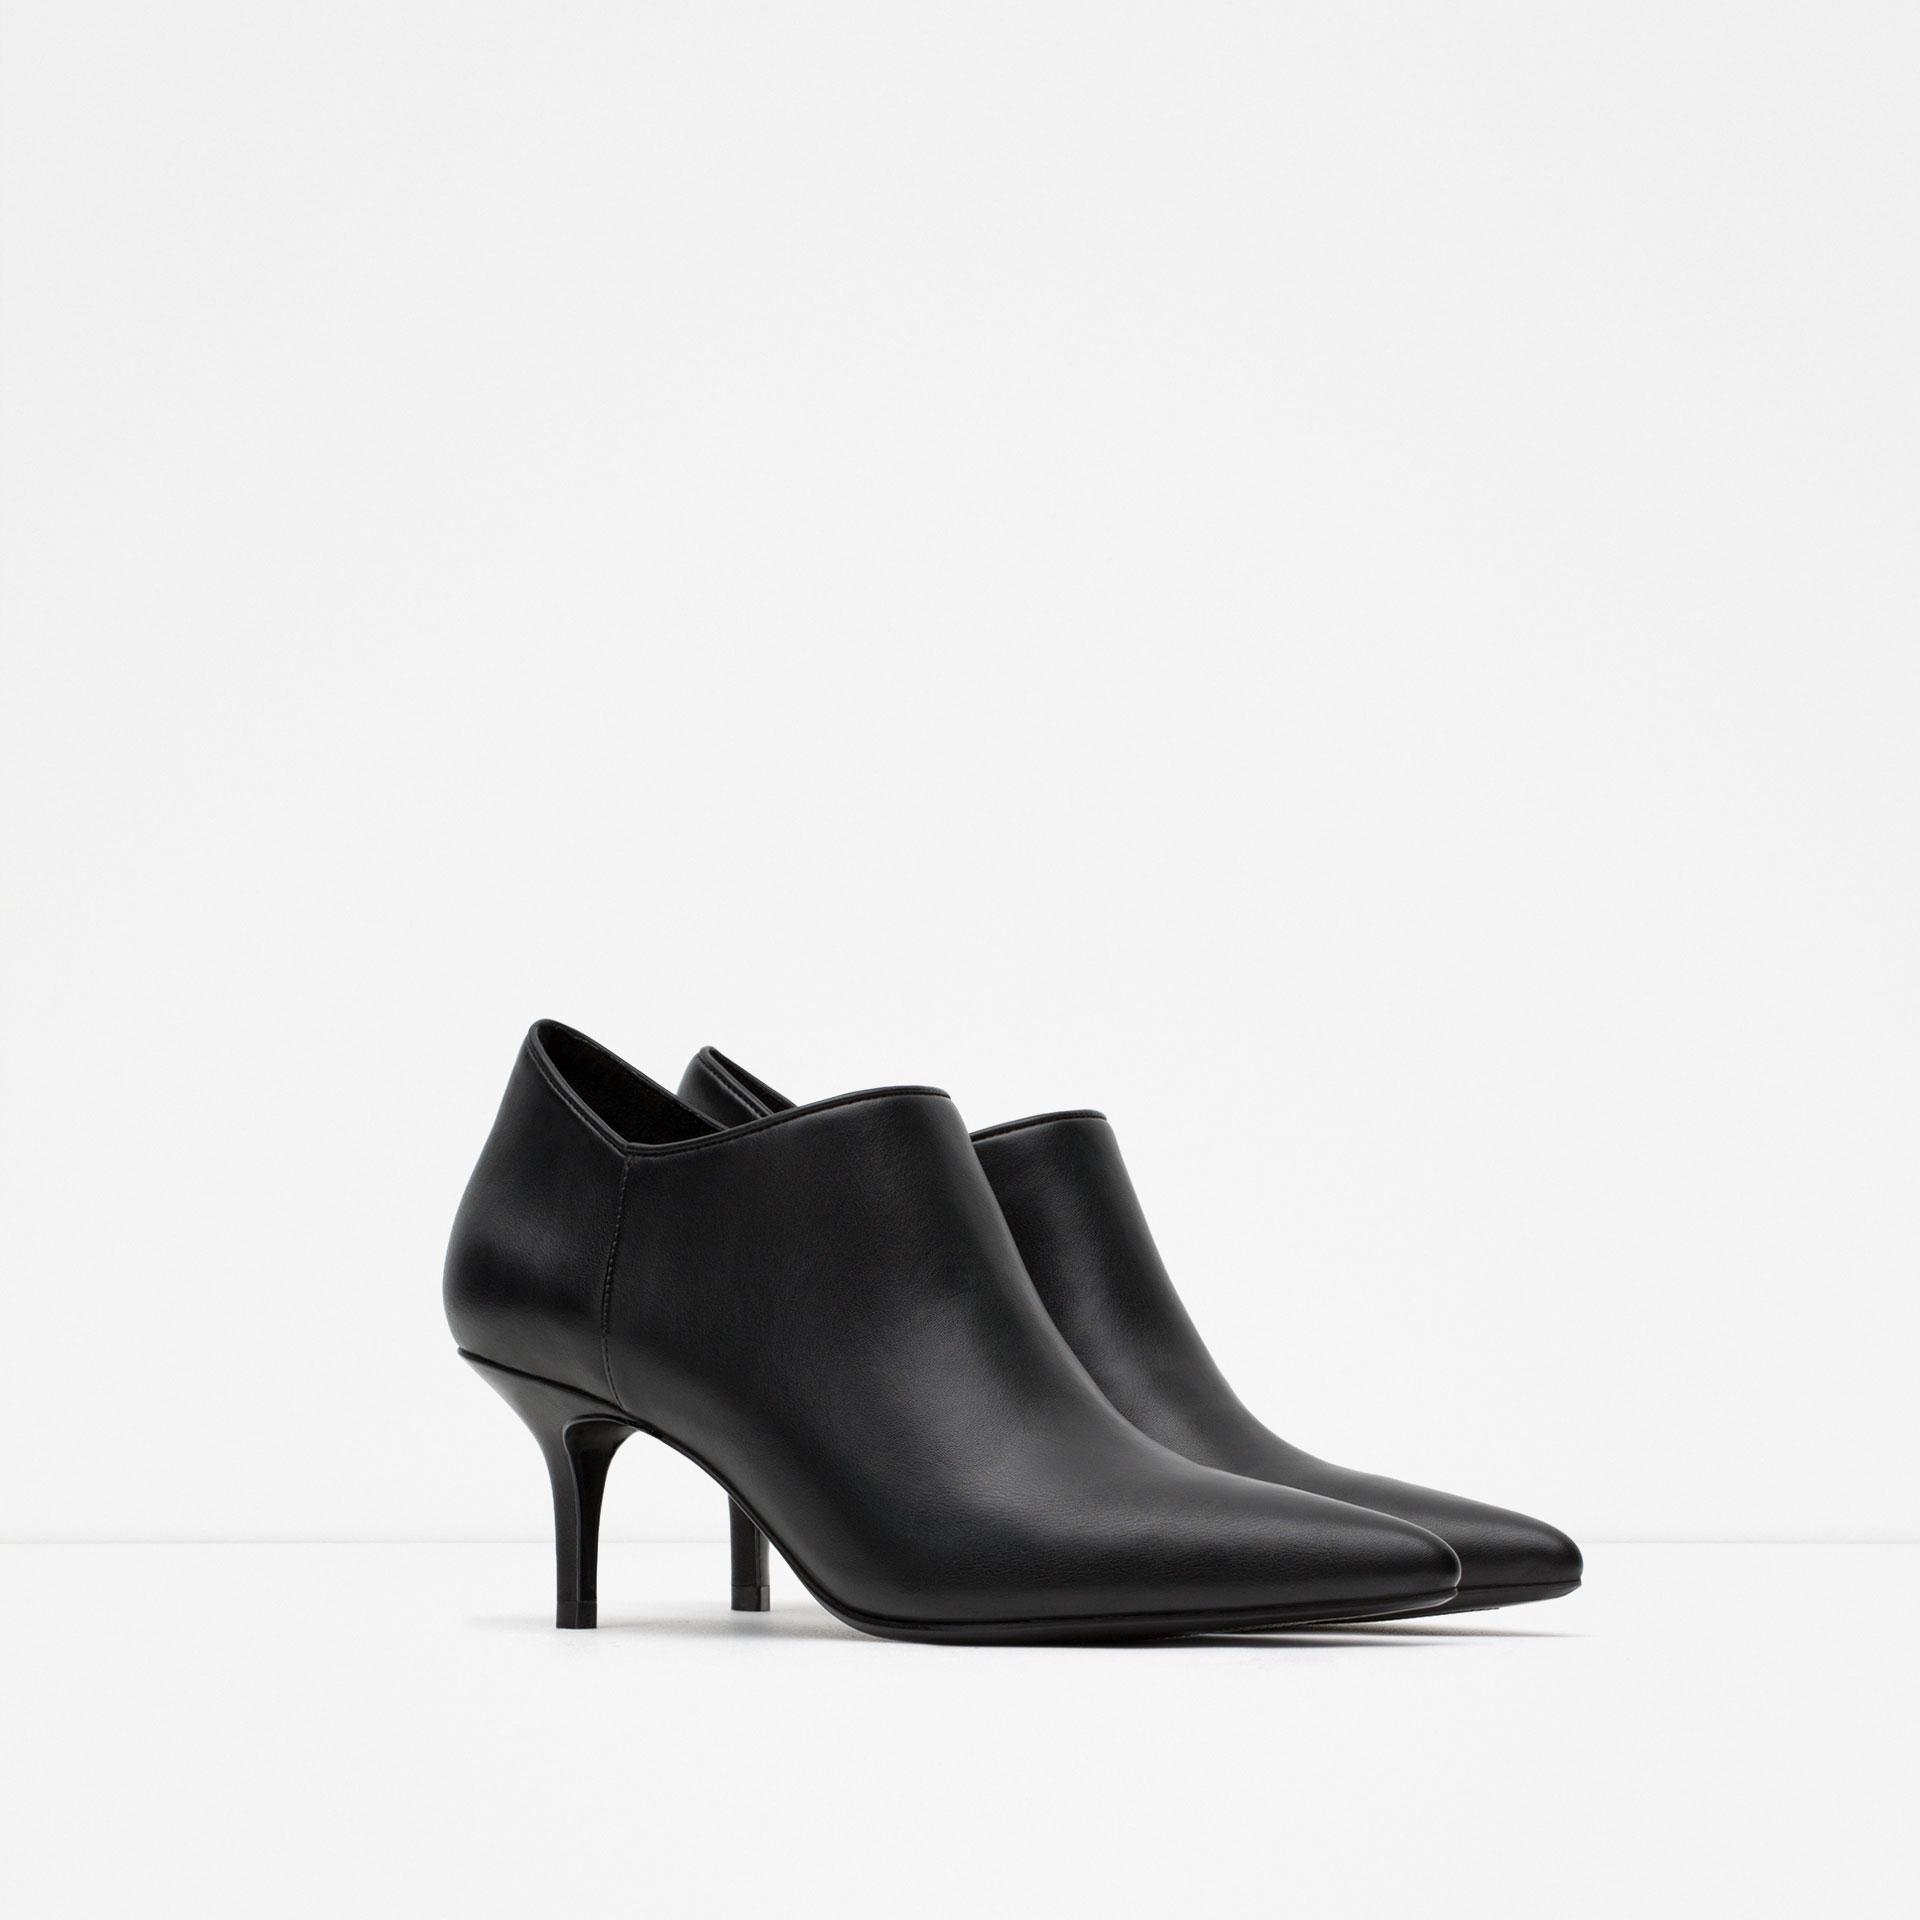 Zara Mid-heel Ankle Boots in Black | Lyst